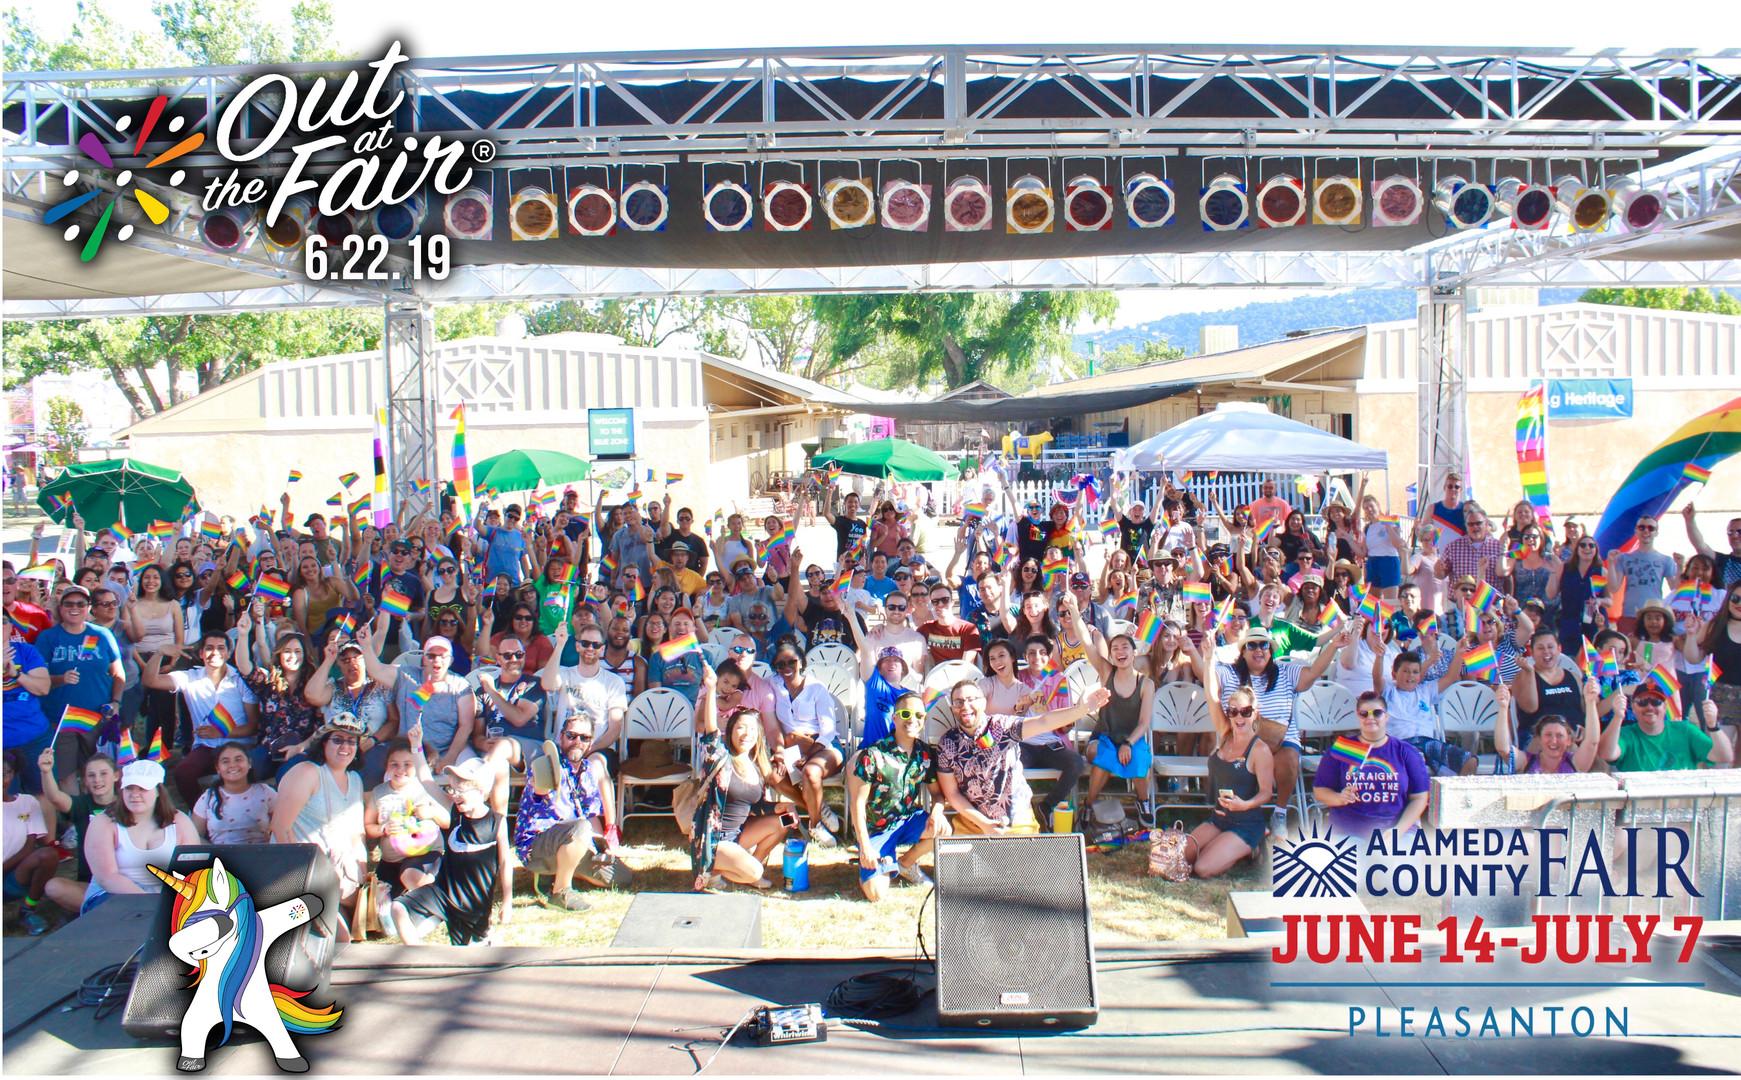 Alameda County Fair - 2019